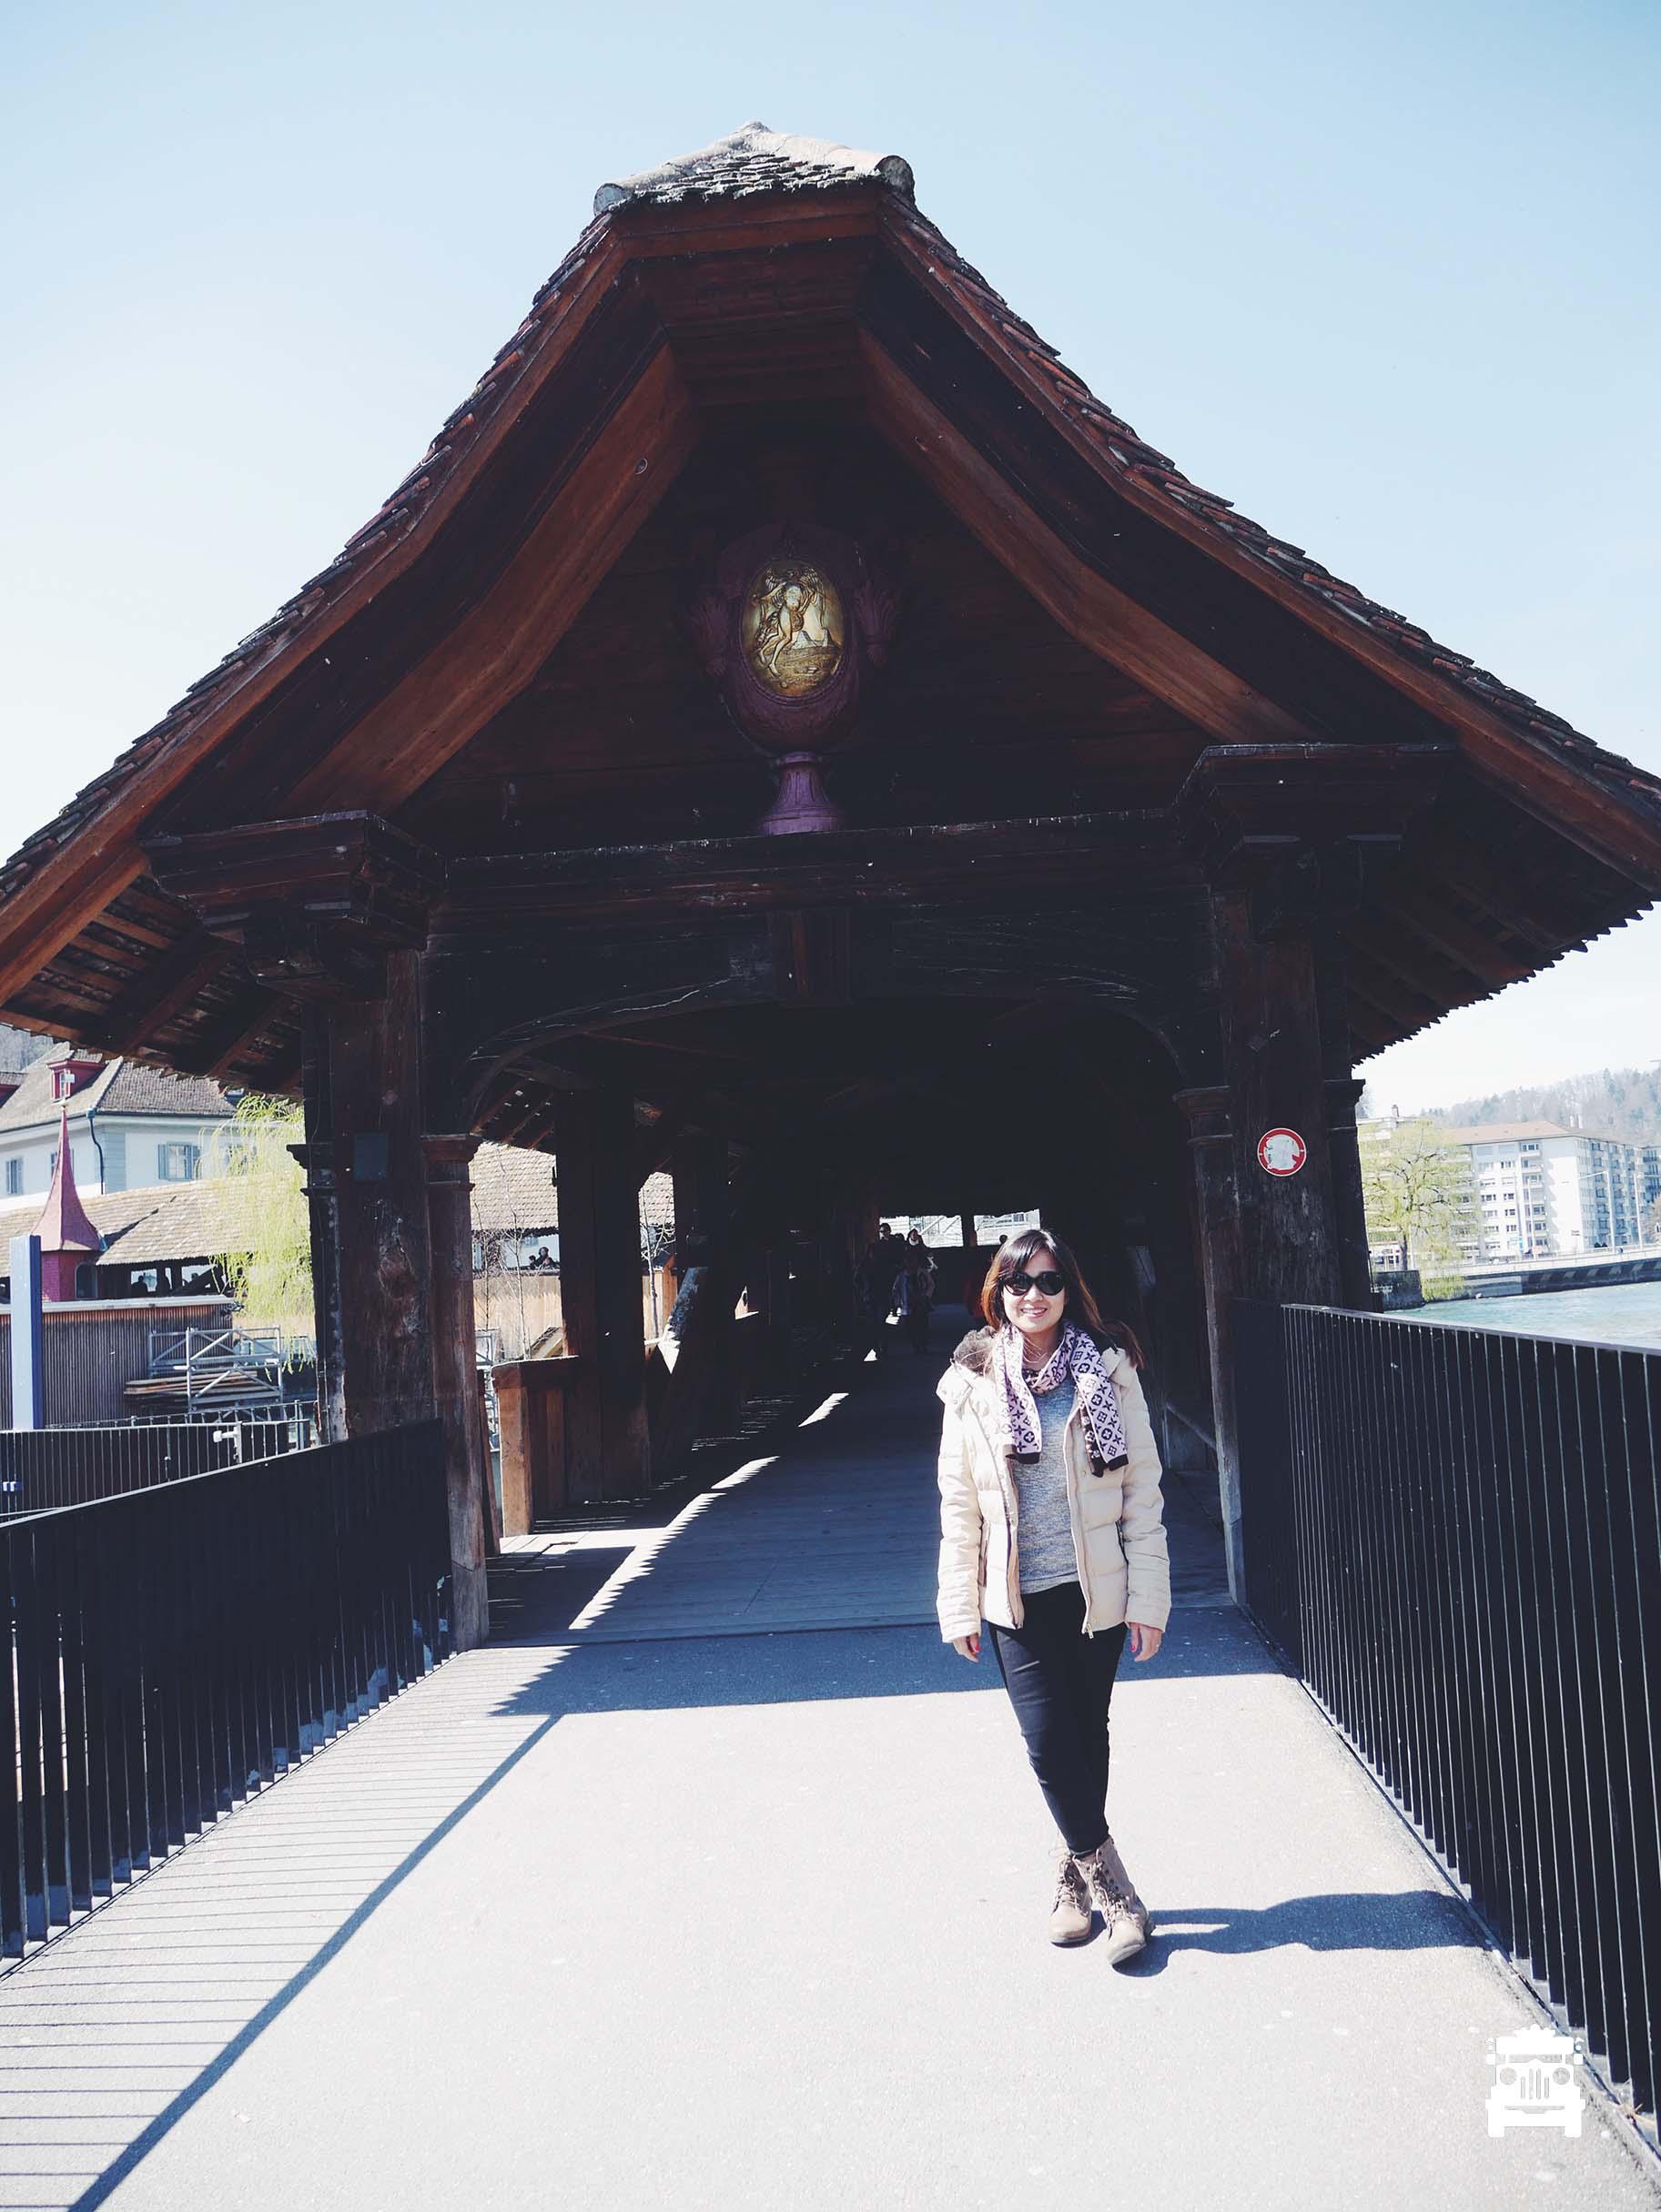 On the Chapel Bridge